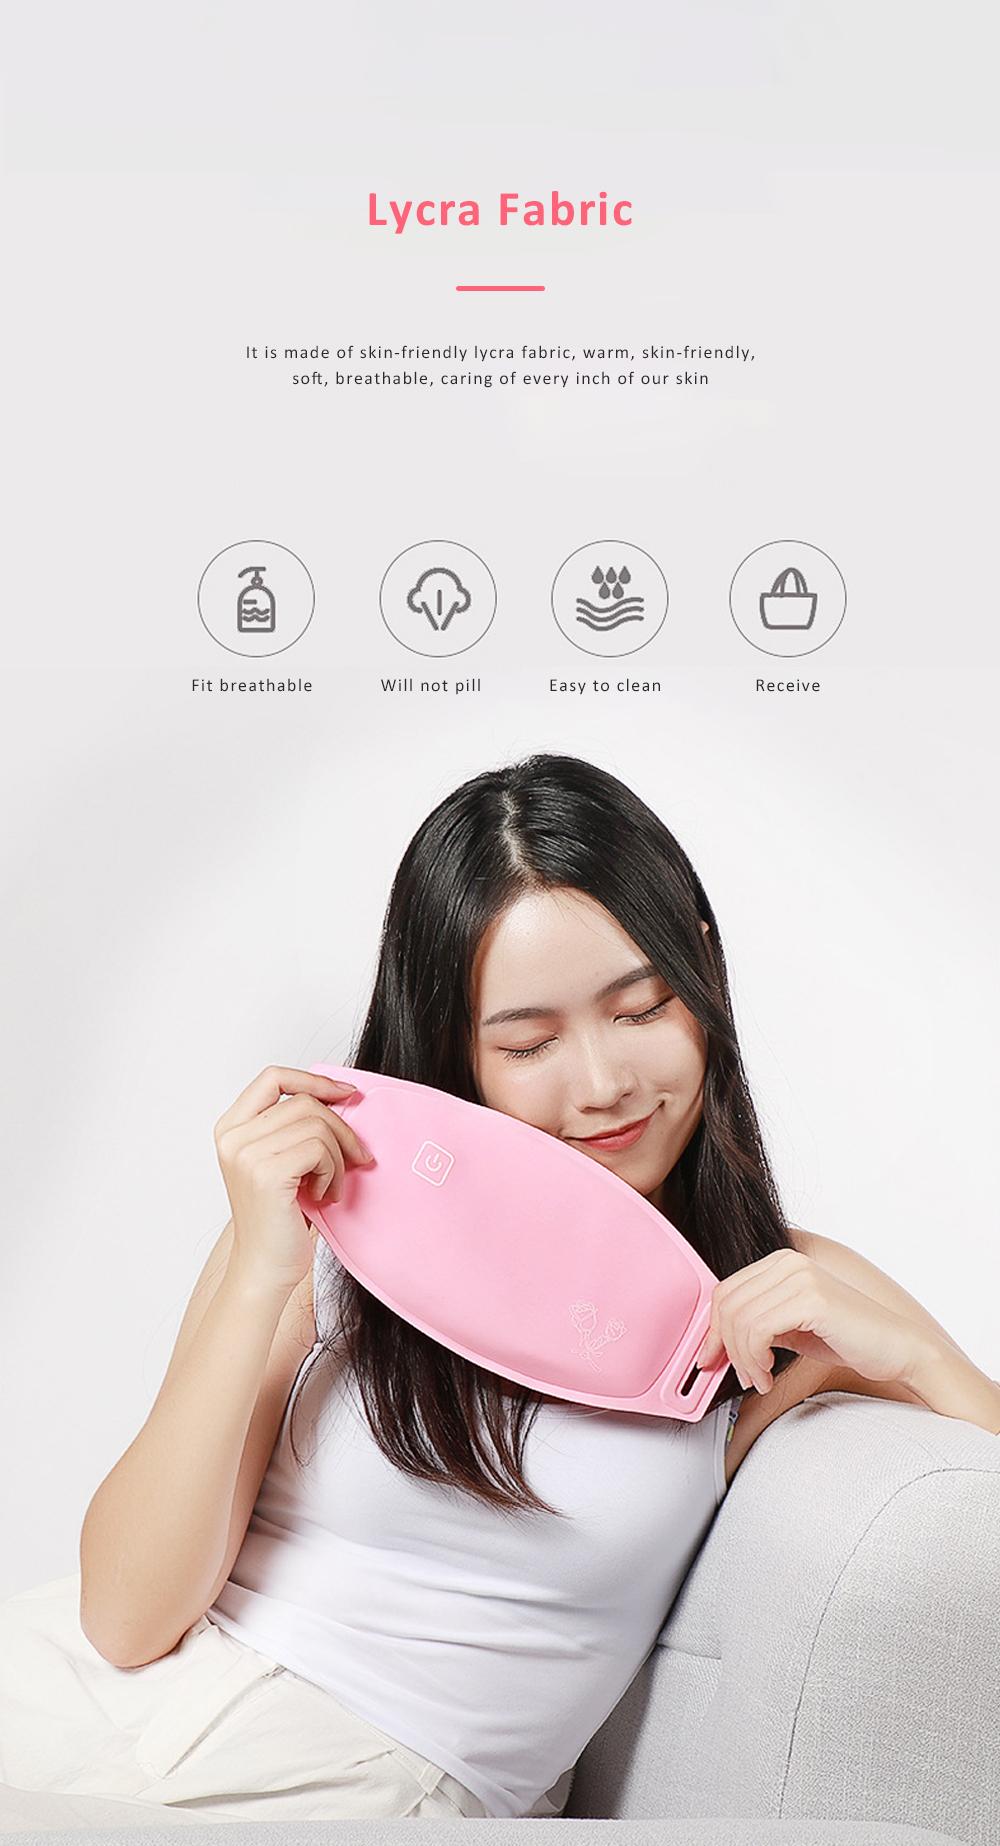 Heating Belt for Women Warm Uterus Graphene Heats up Quickly Intelligent Constant Temperature Warmer Tool with Vibration Massage 6